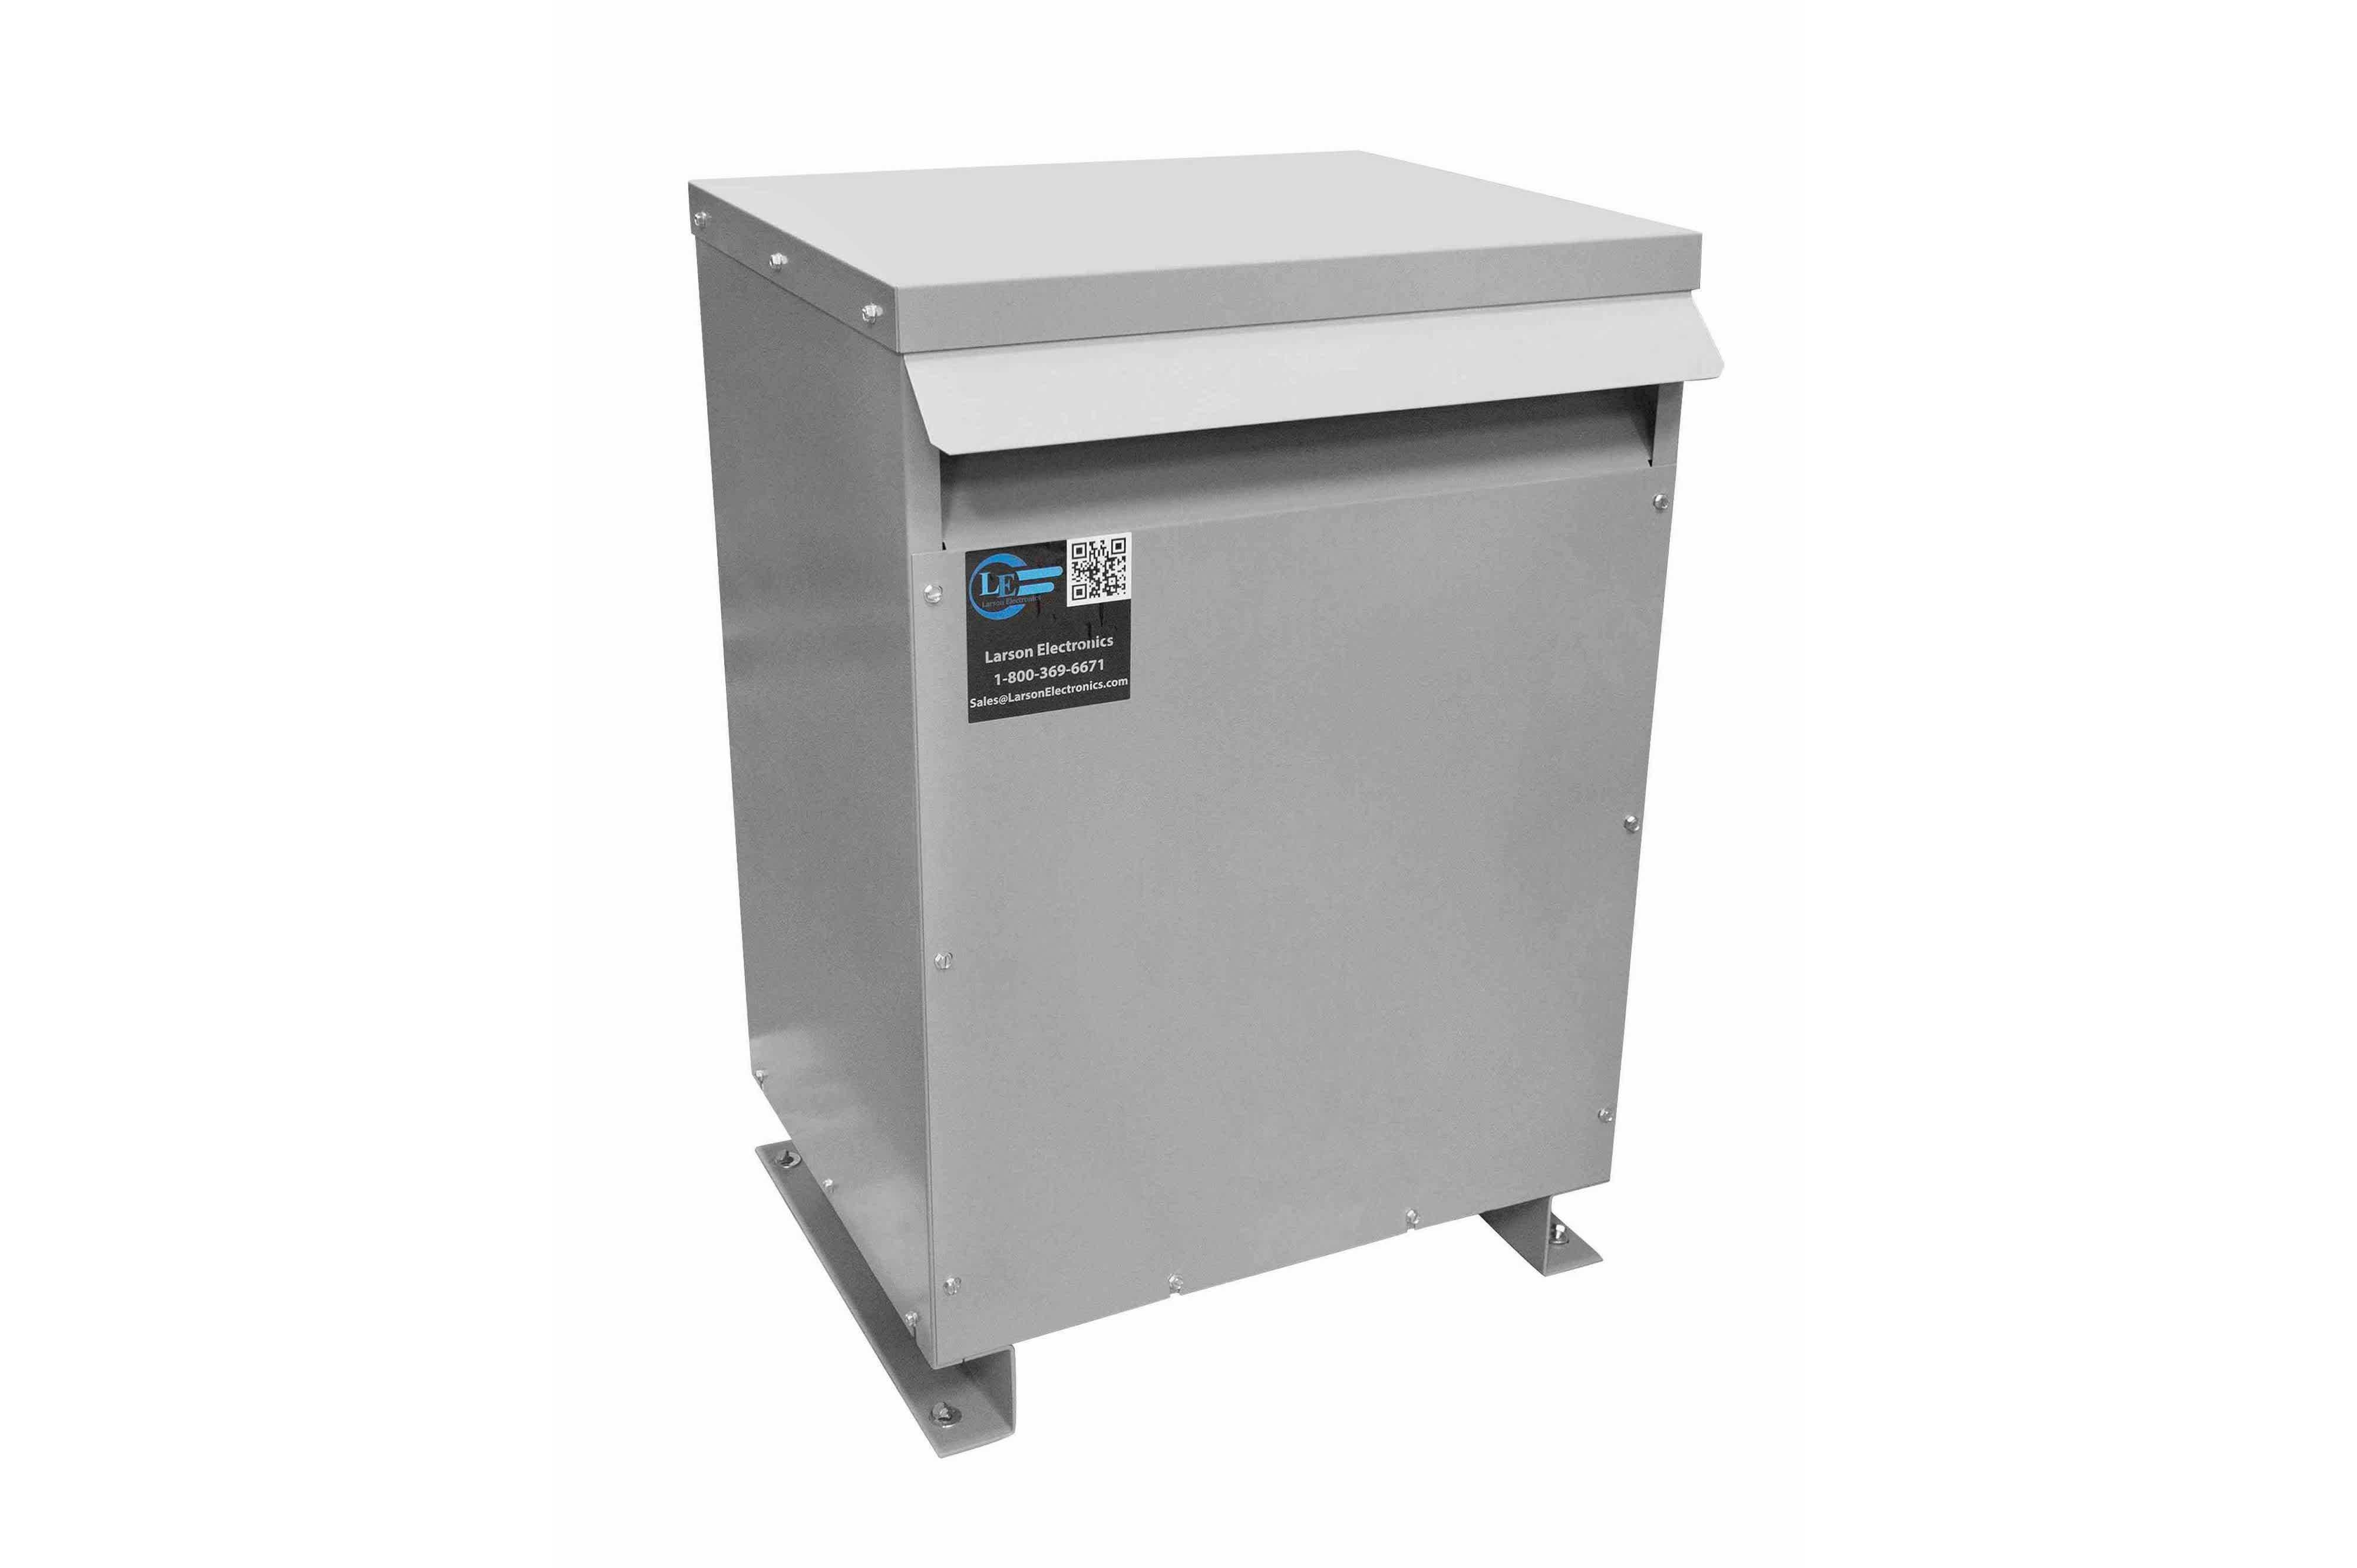 13 kVA 3PH Isolation Transformer, 575V Wye Primary, 240V/120 Delta Secondary, N3R, Ventilated, 60 Hz